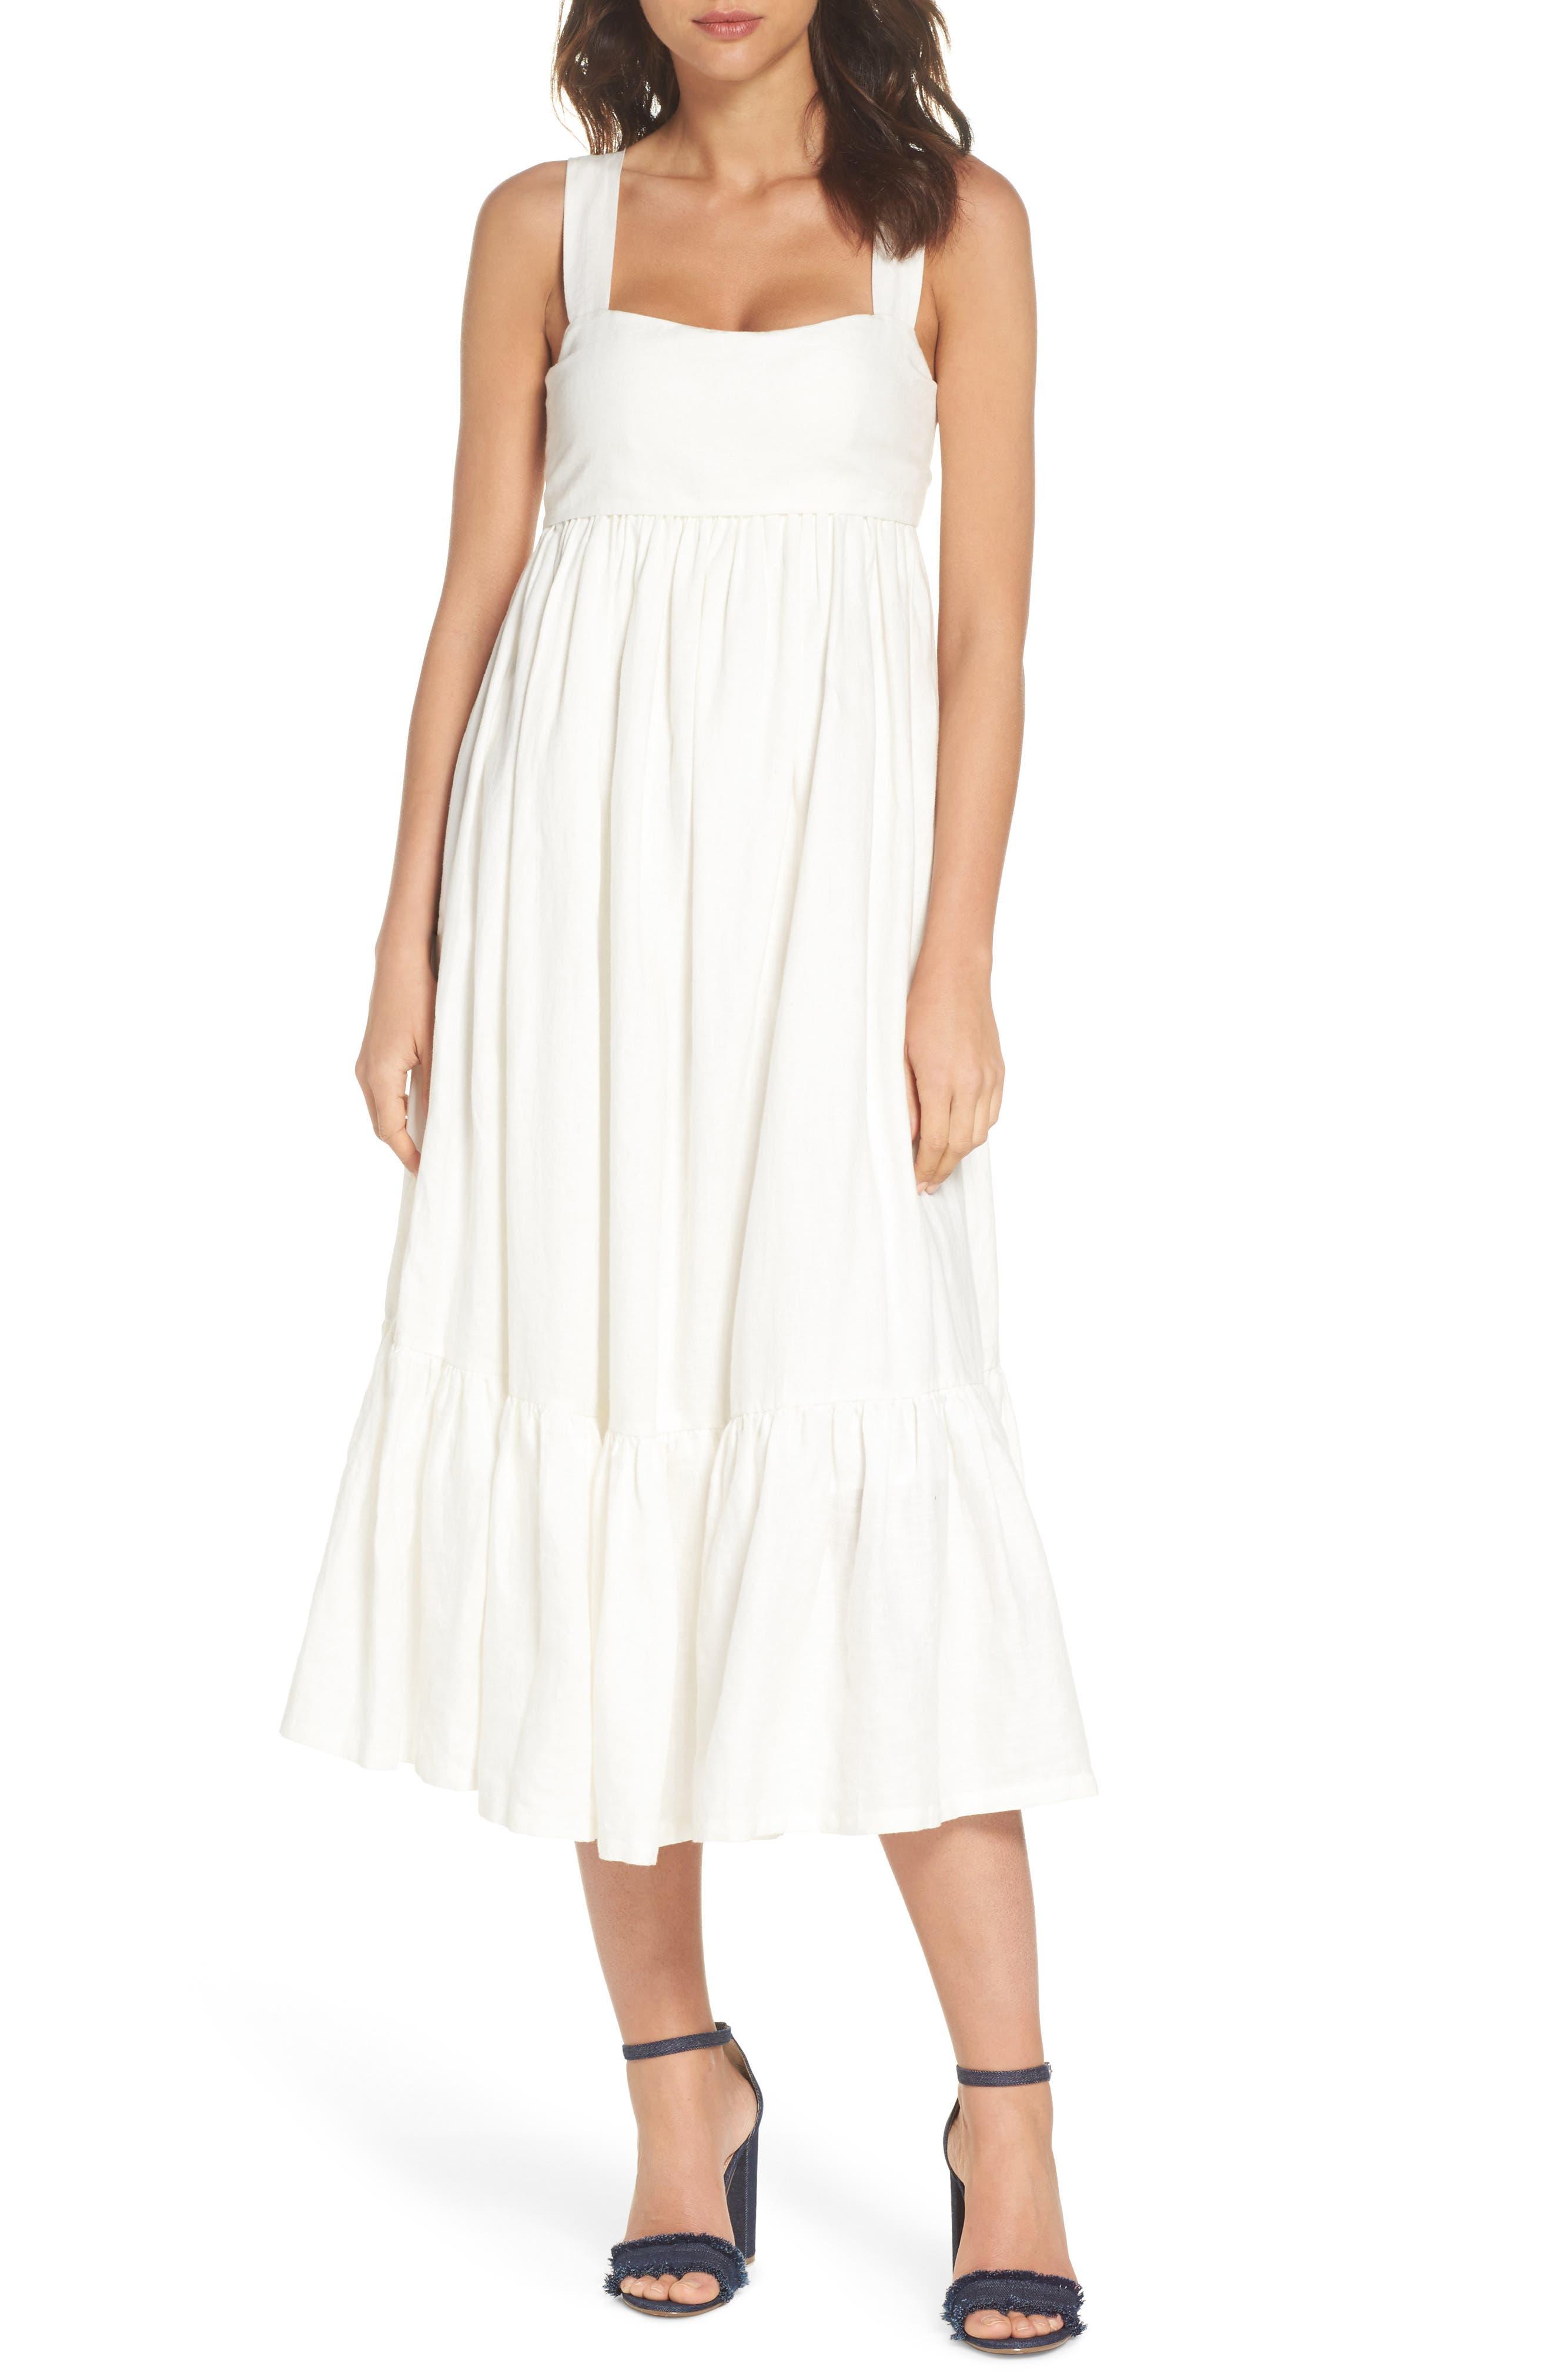 Alternate Image 1 Selected - CAARA Forget Me Not Linen Midi Dress